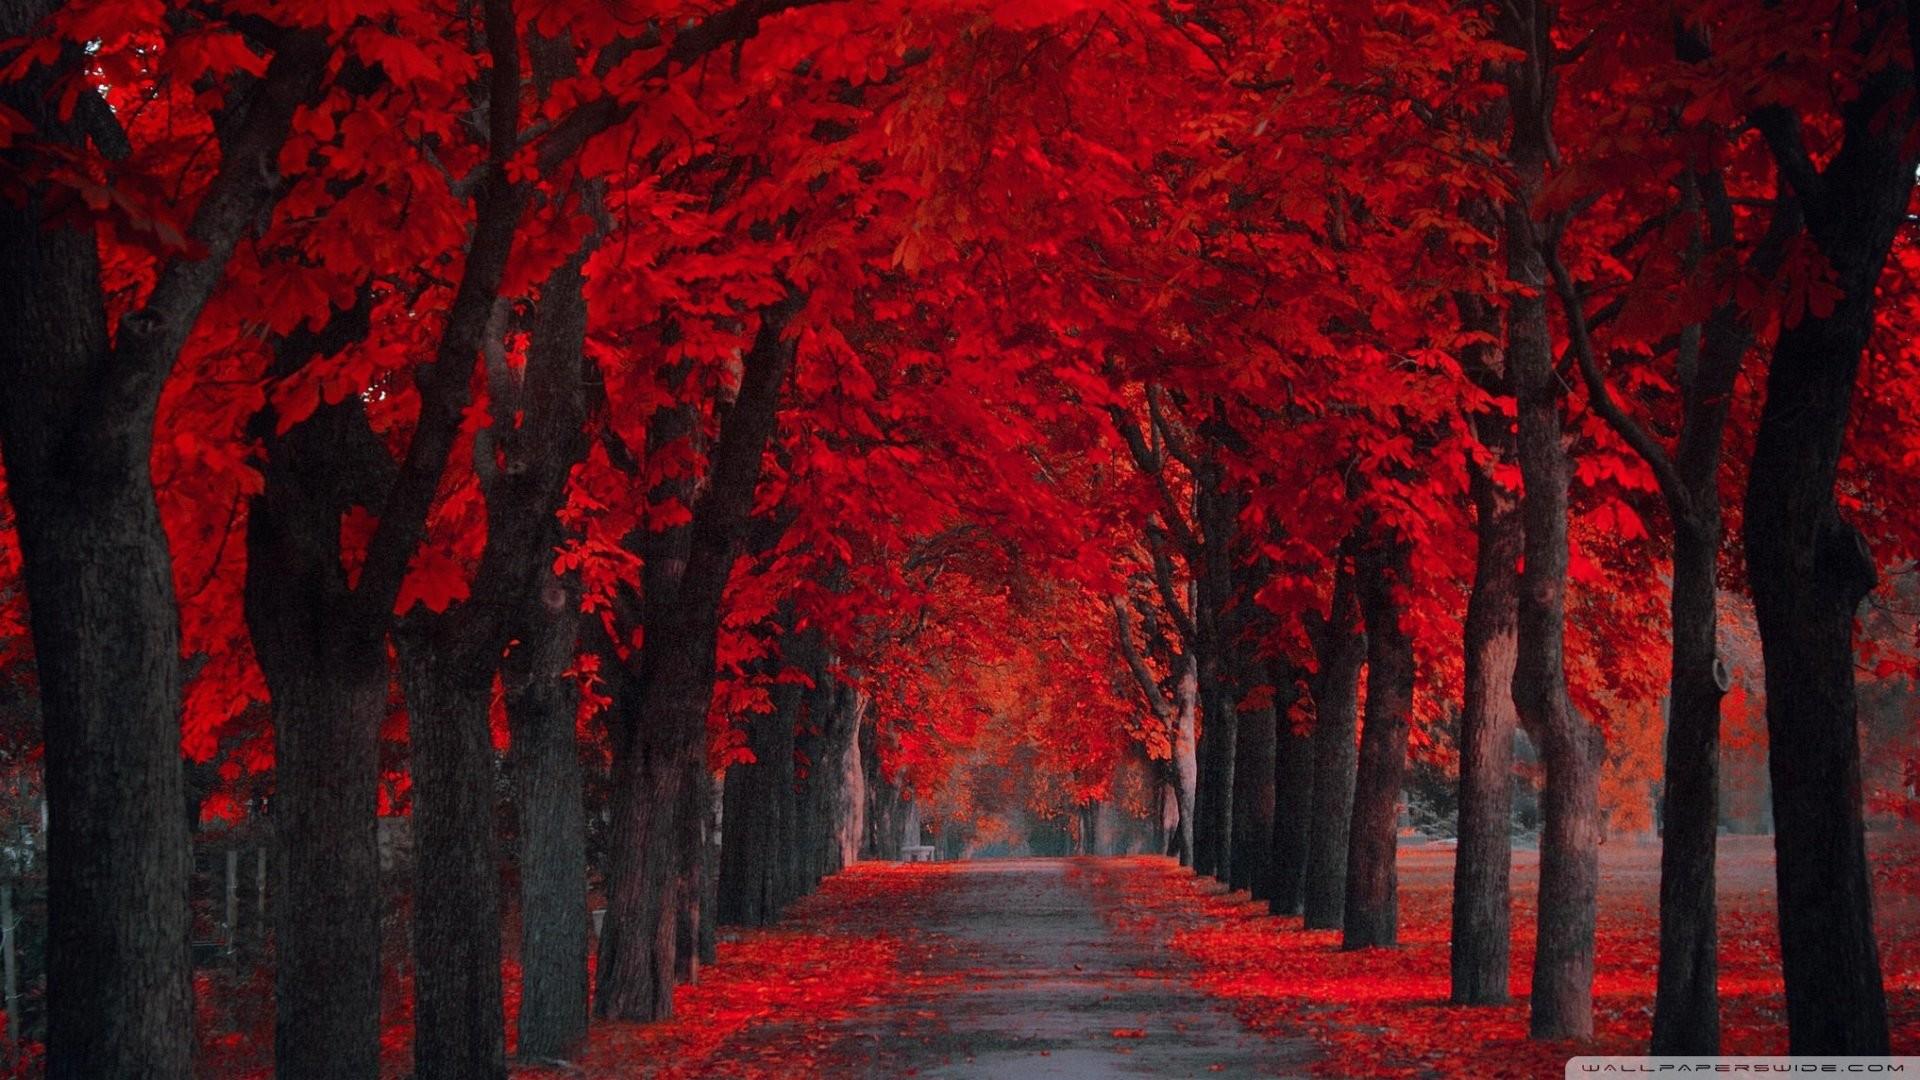 Red Leaves Fall Backgrounds, HQ, Kenyatta Miltenberger